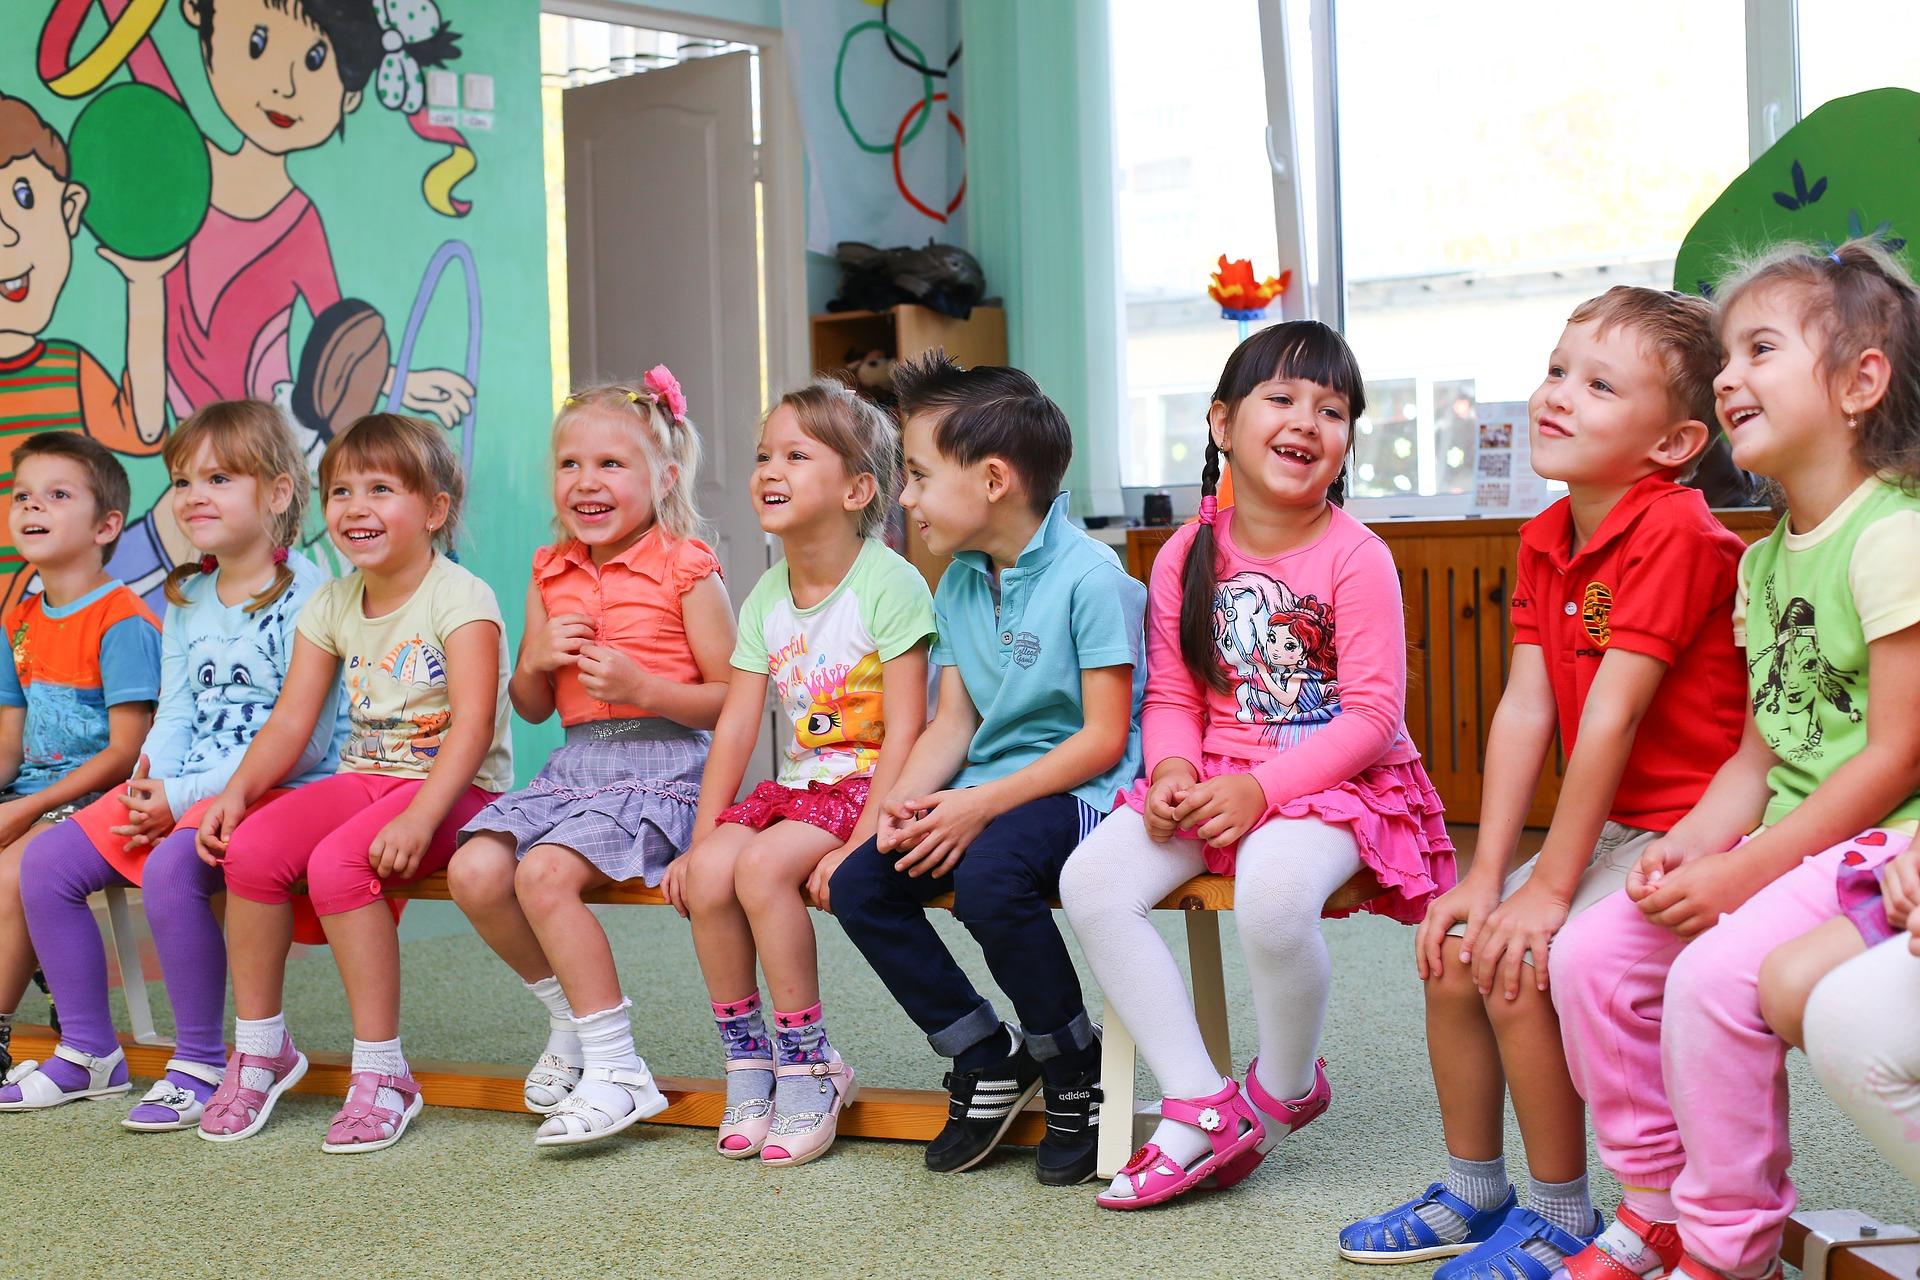 kindergarten-2204239_1920.jpg